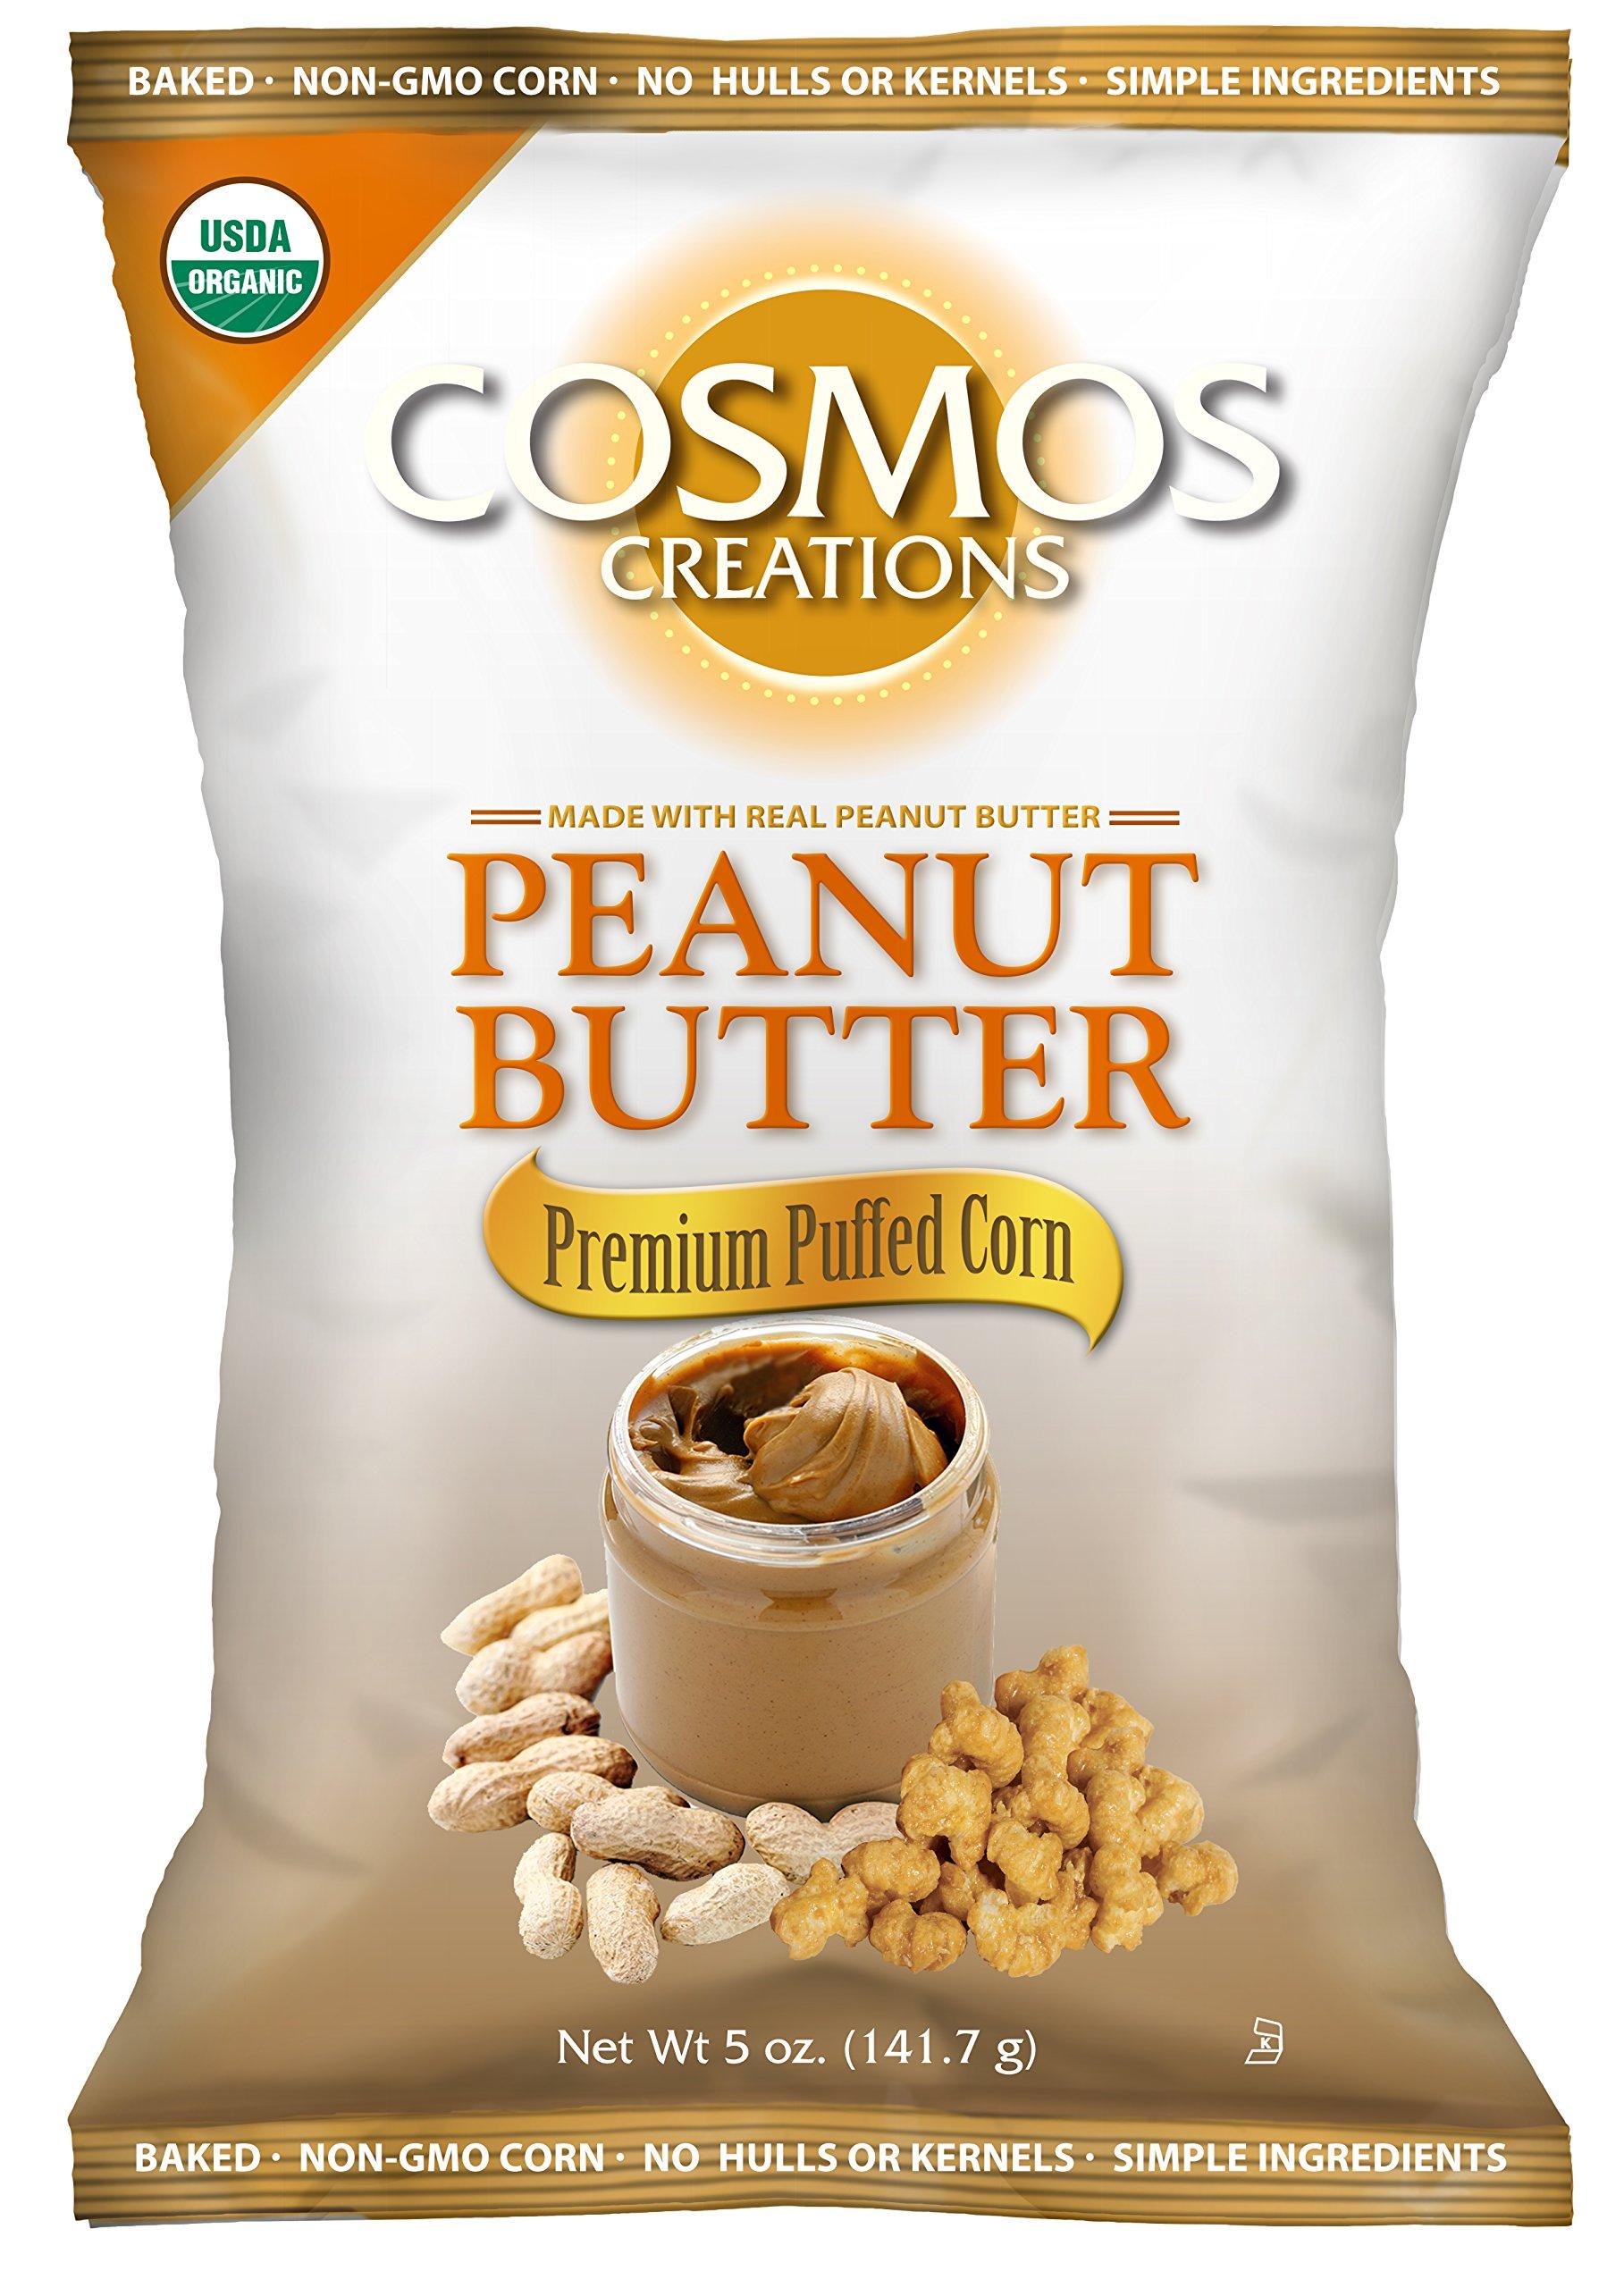 Cosmos Creations Organic Peanut Butter Premium Puffed Corn 5 oz bag, case of 10